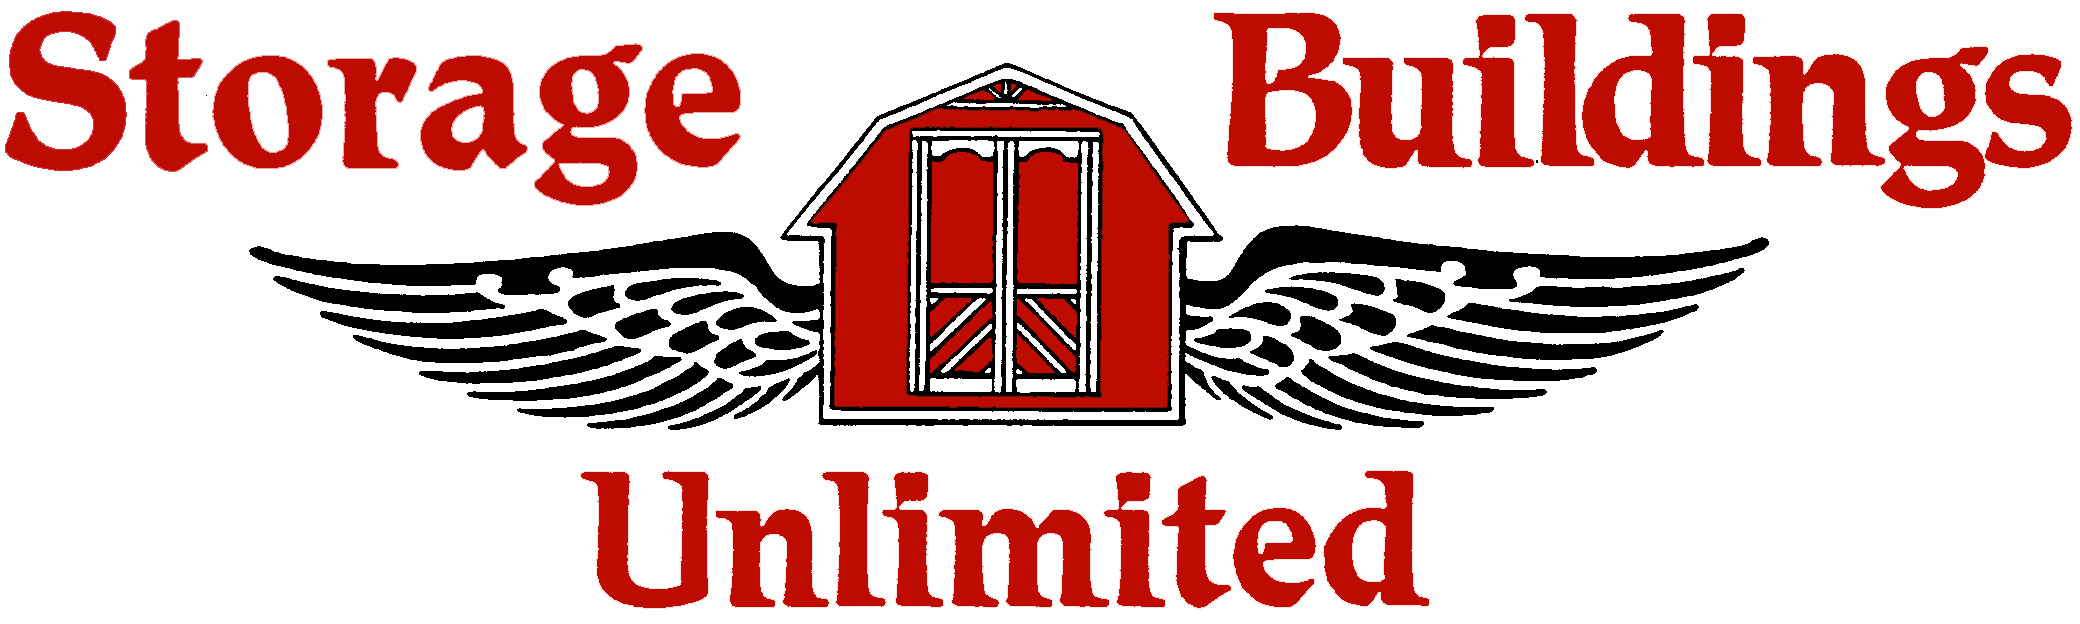 Storage Buildings Unlimited Logo